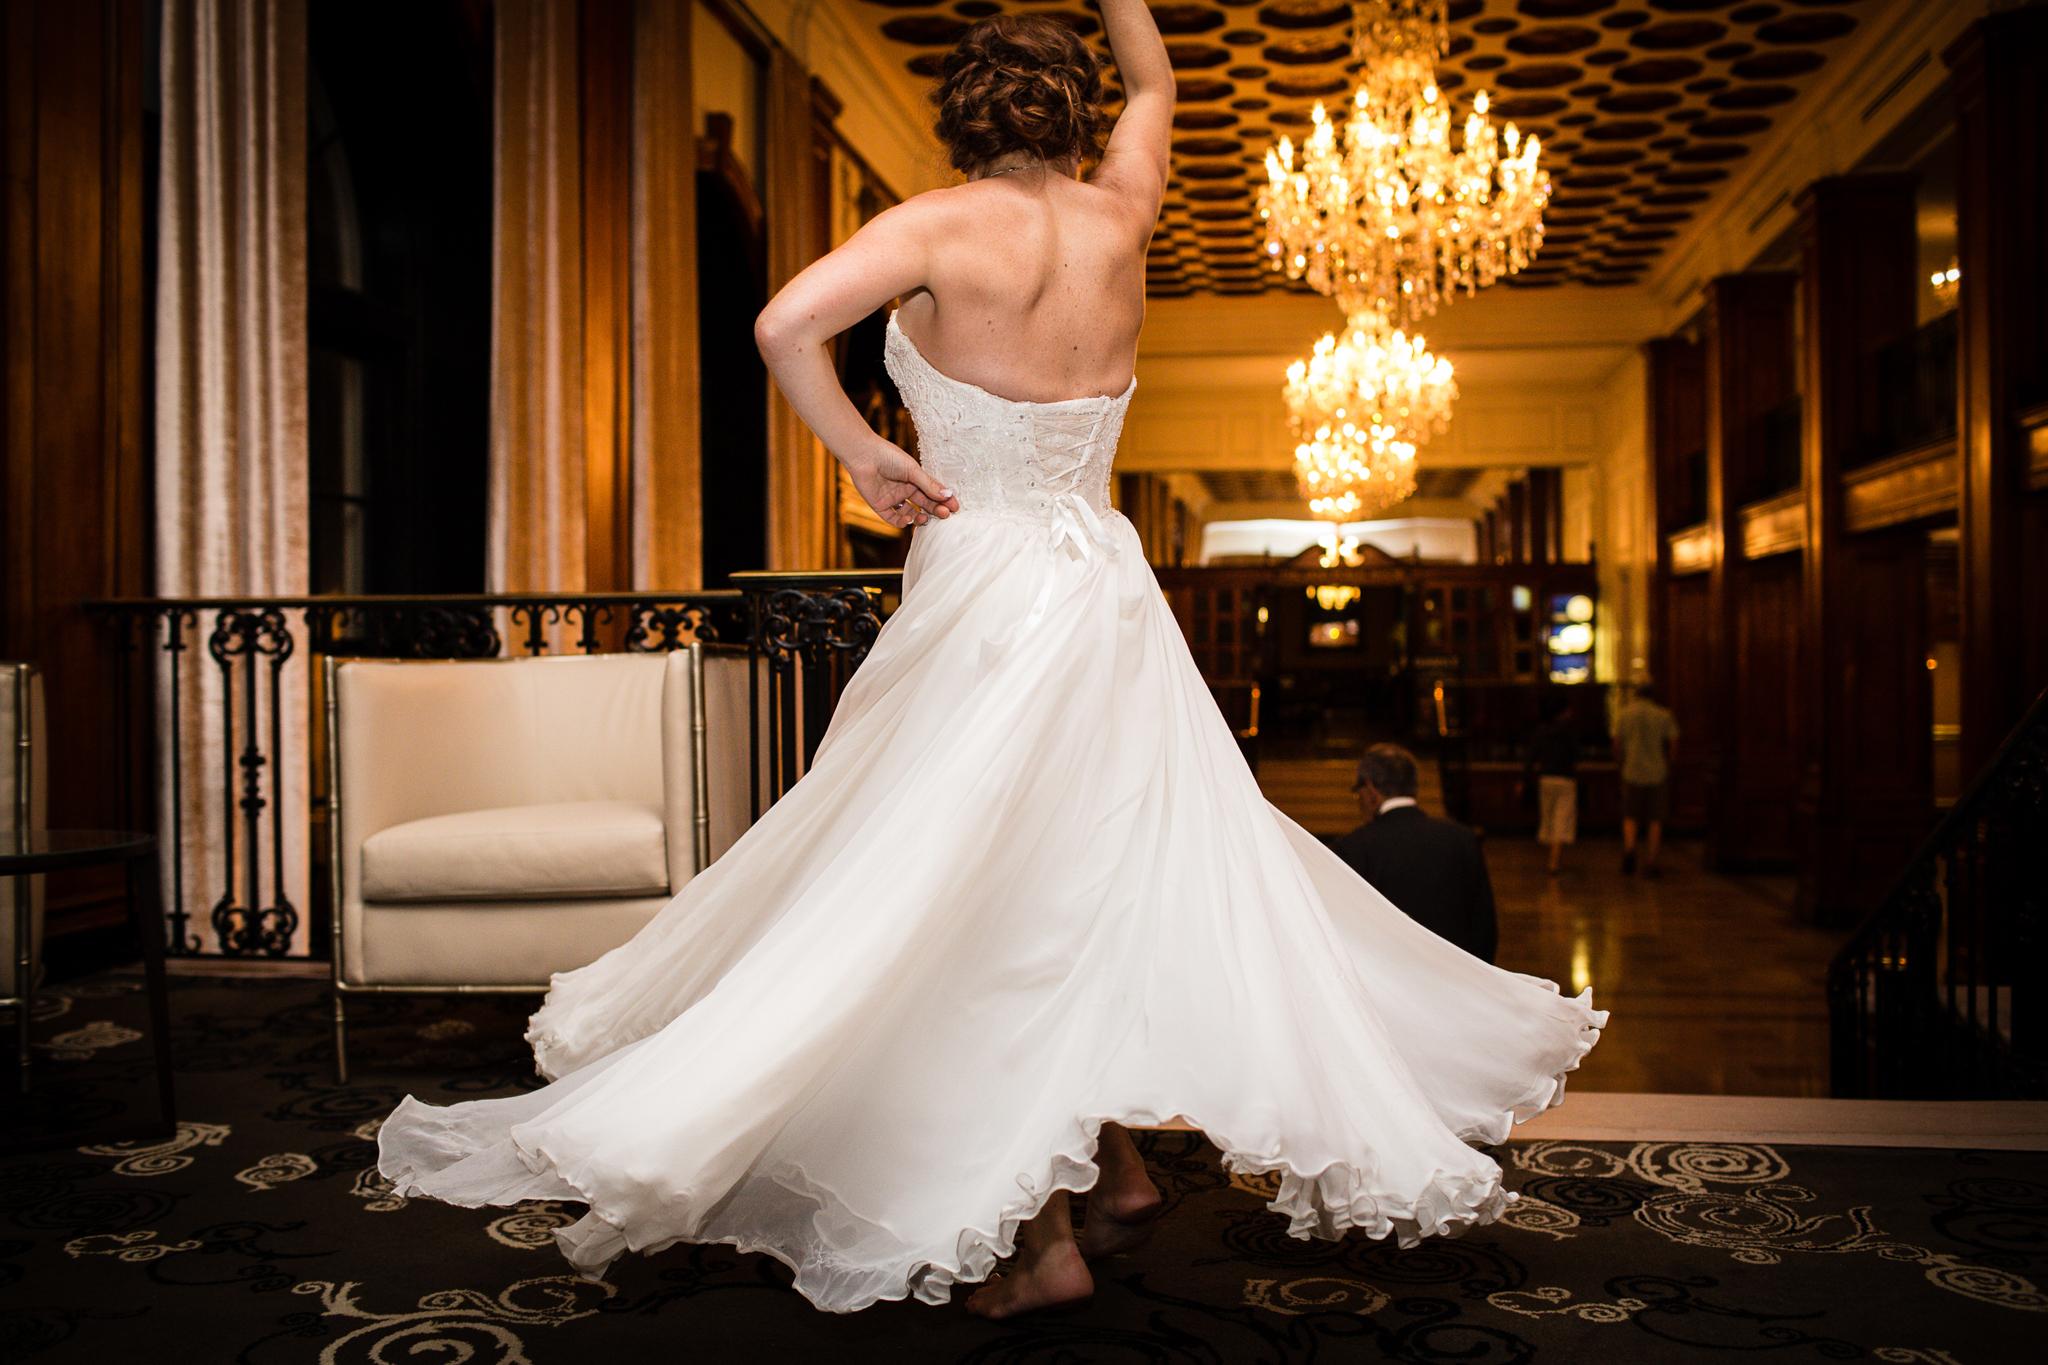 33-LORD-NELSON-WEDDING-VENUE-HALIFAX.jpg